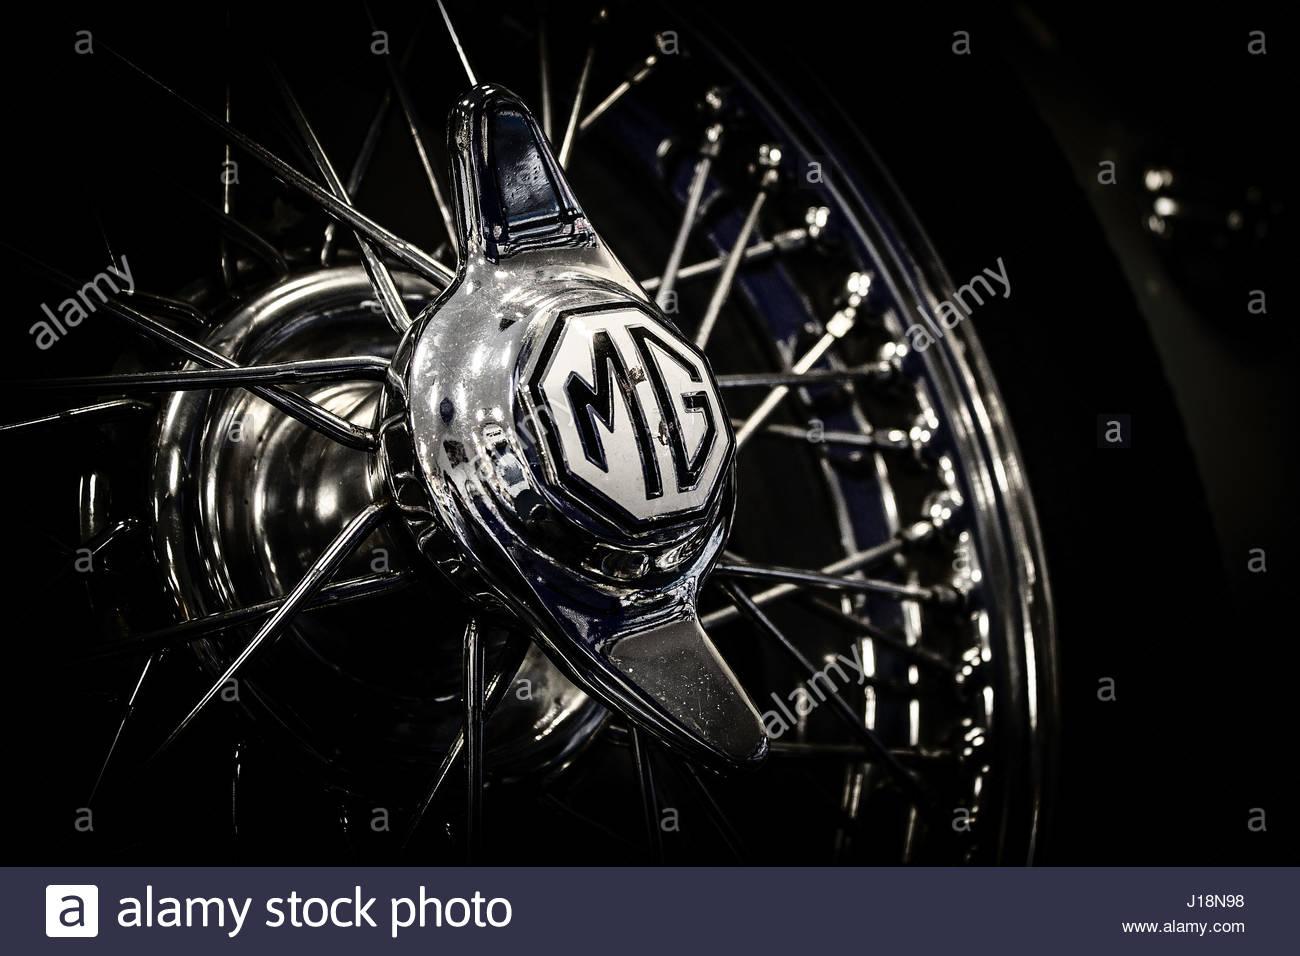 Chrome Spoke Wheel Stockfotos & Chrome Spoke Wheel Bilder - Alamy